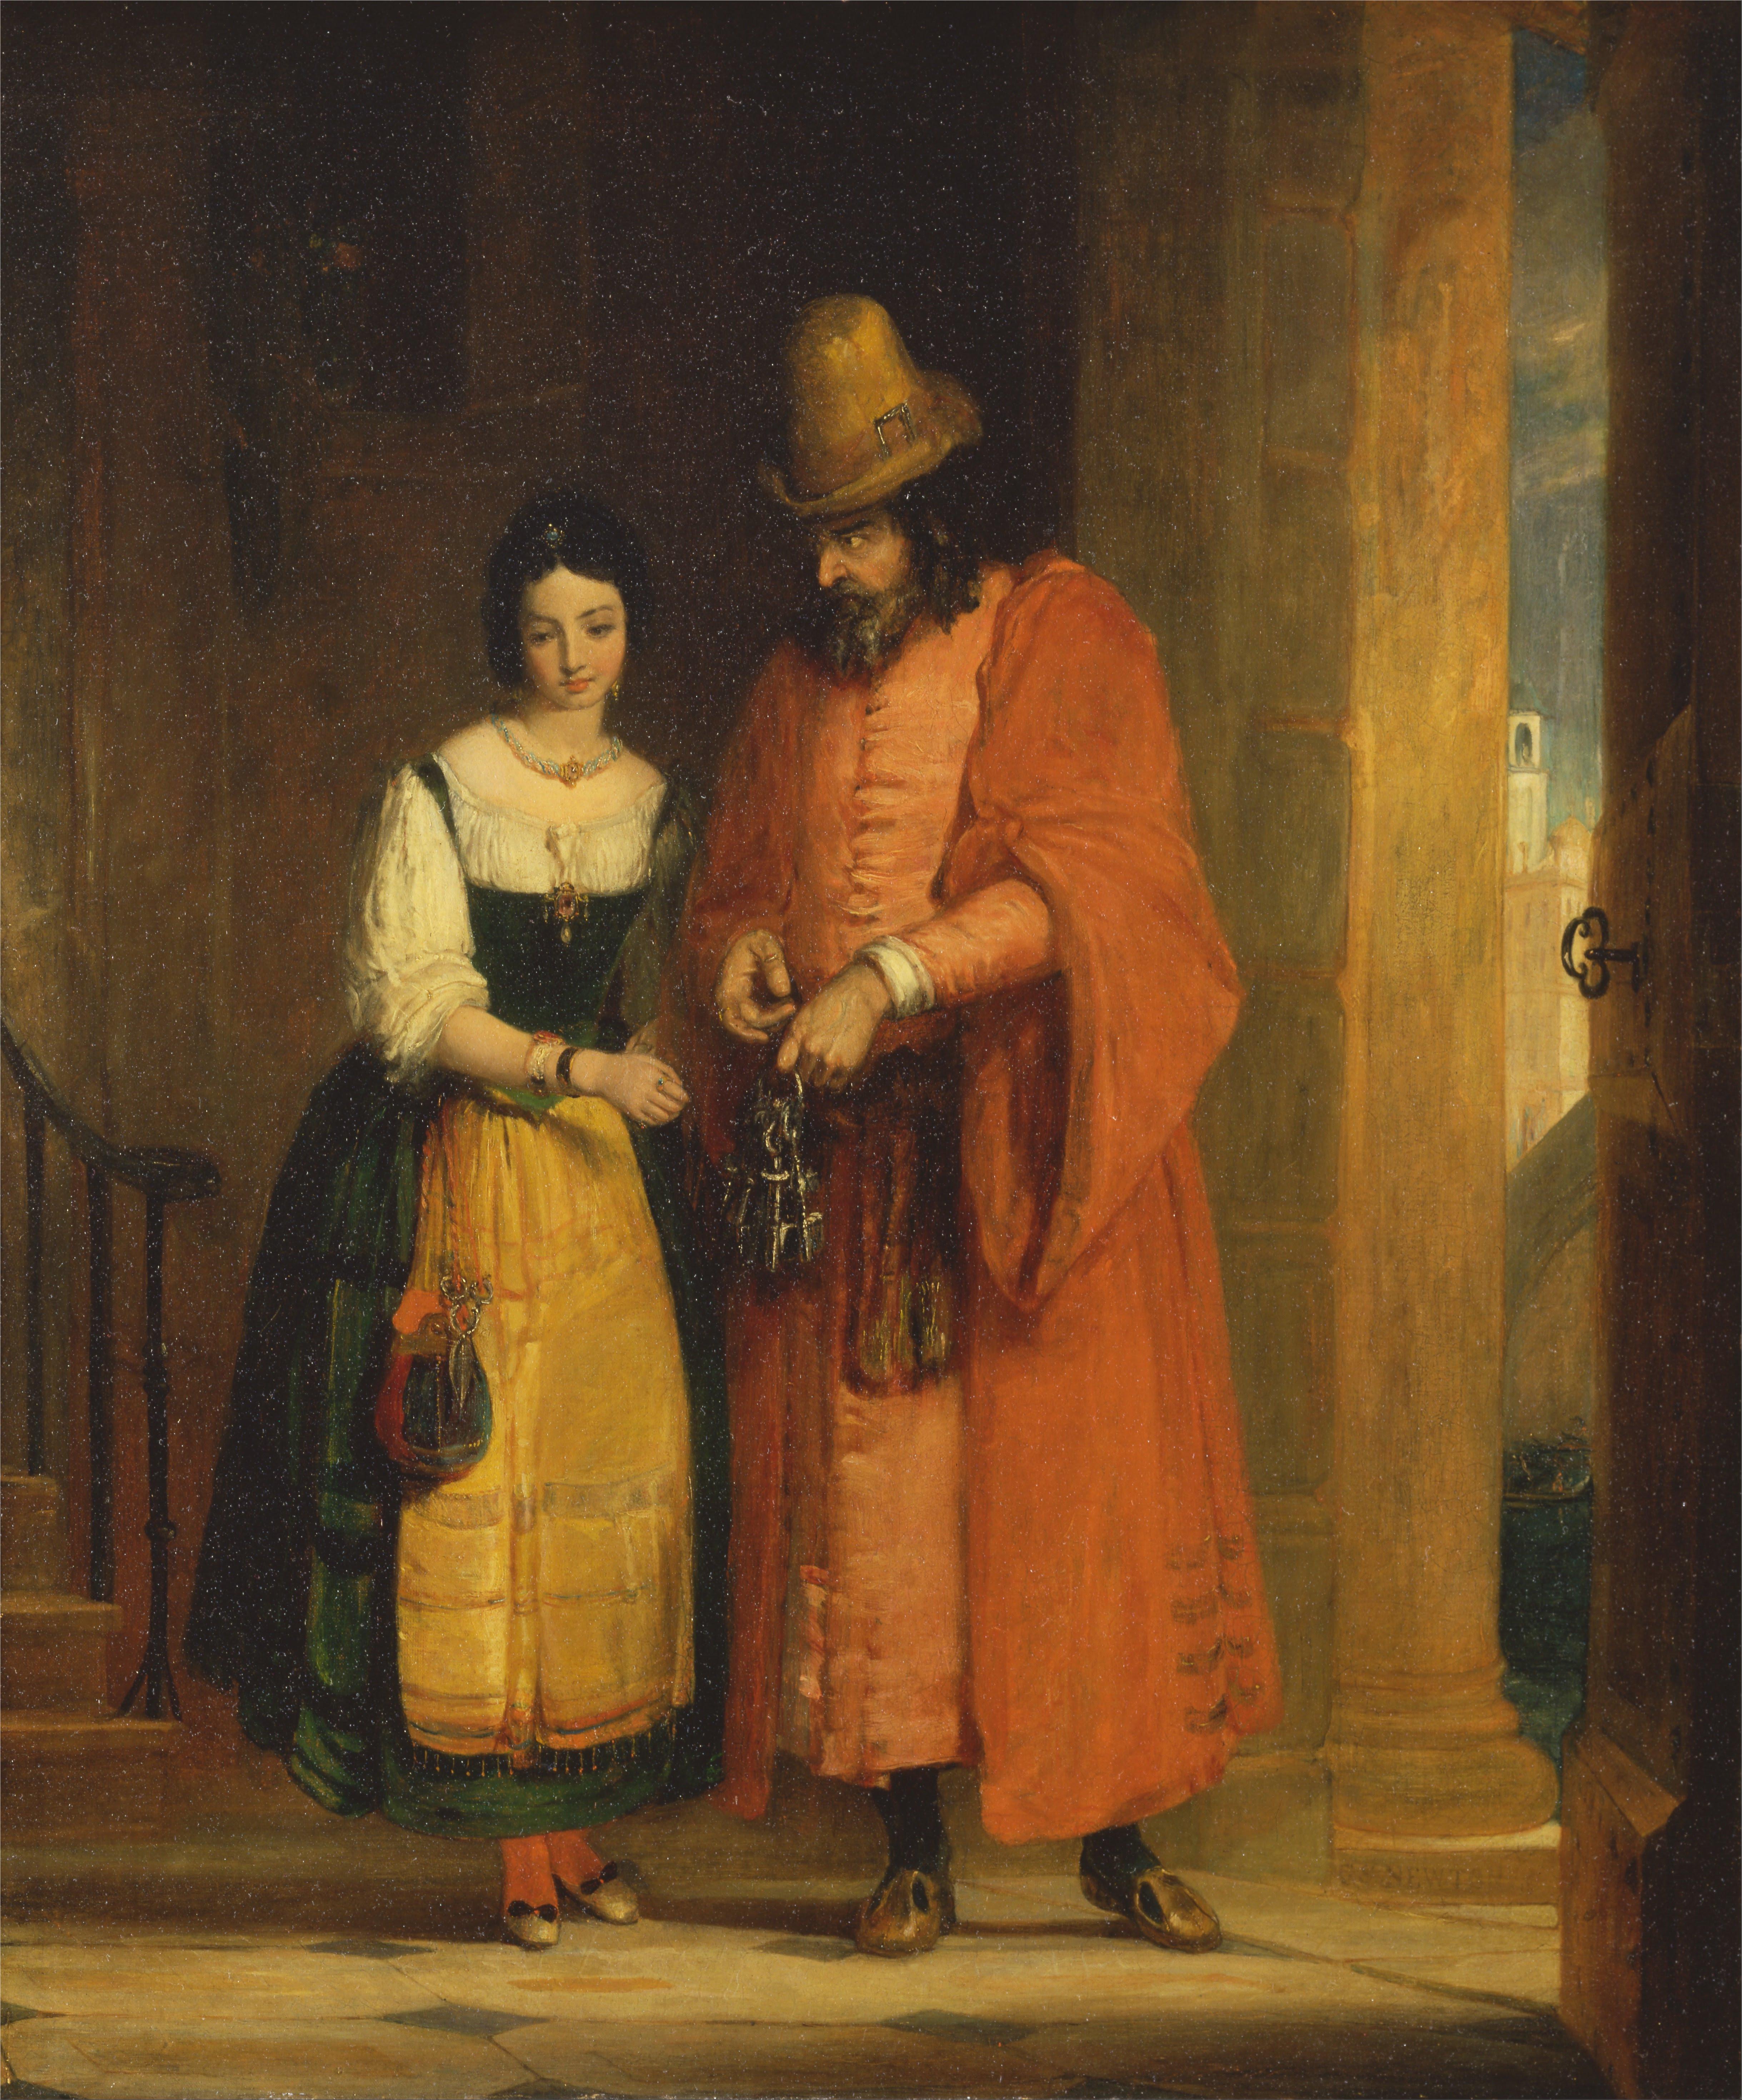 Merchant of Venice - Modern Humanitarianism